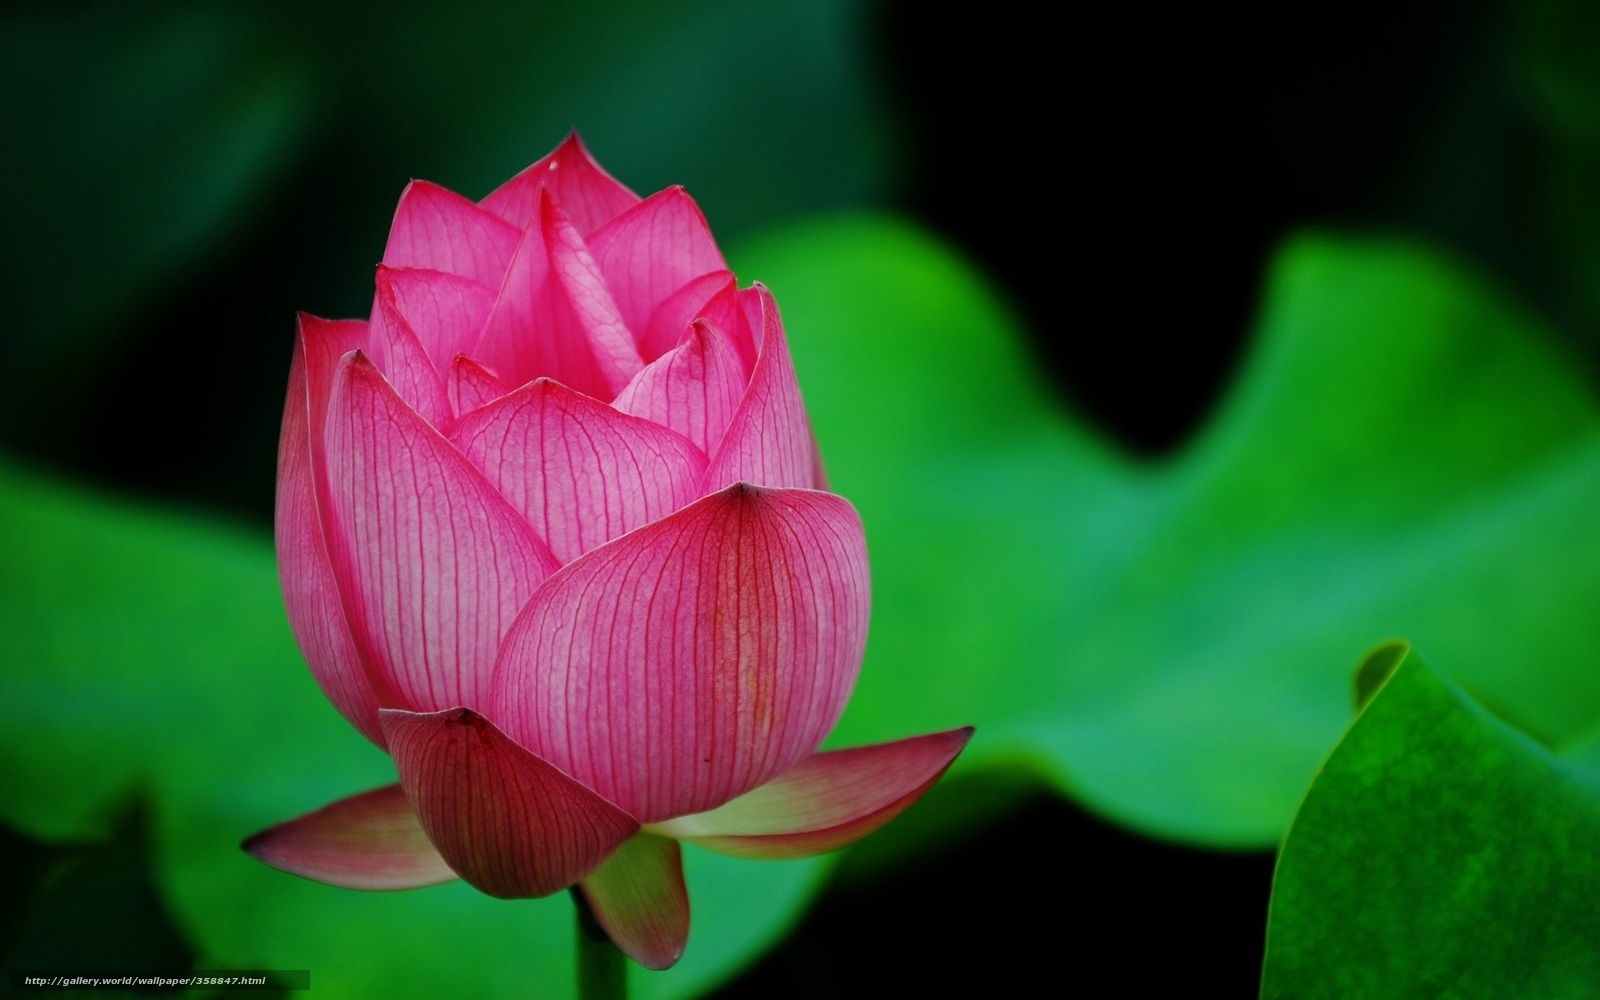 Tlcharger Fond D Ecran Lotus Fleur Macro Bourgeon Fonds